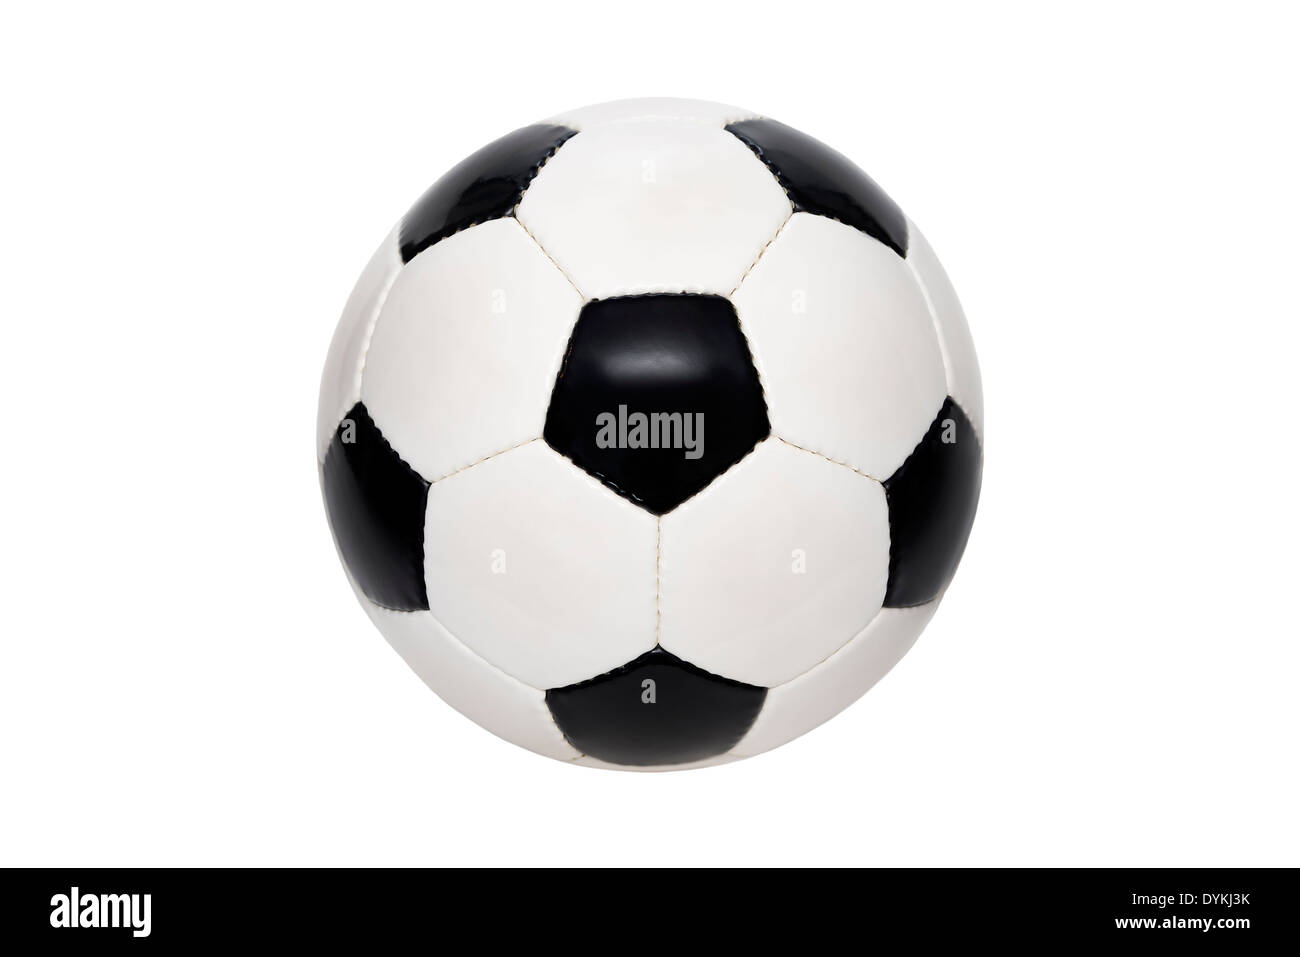 football soccer ball - Stock Image